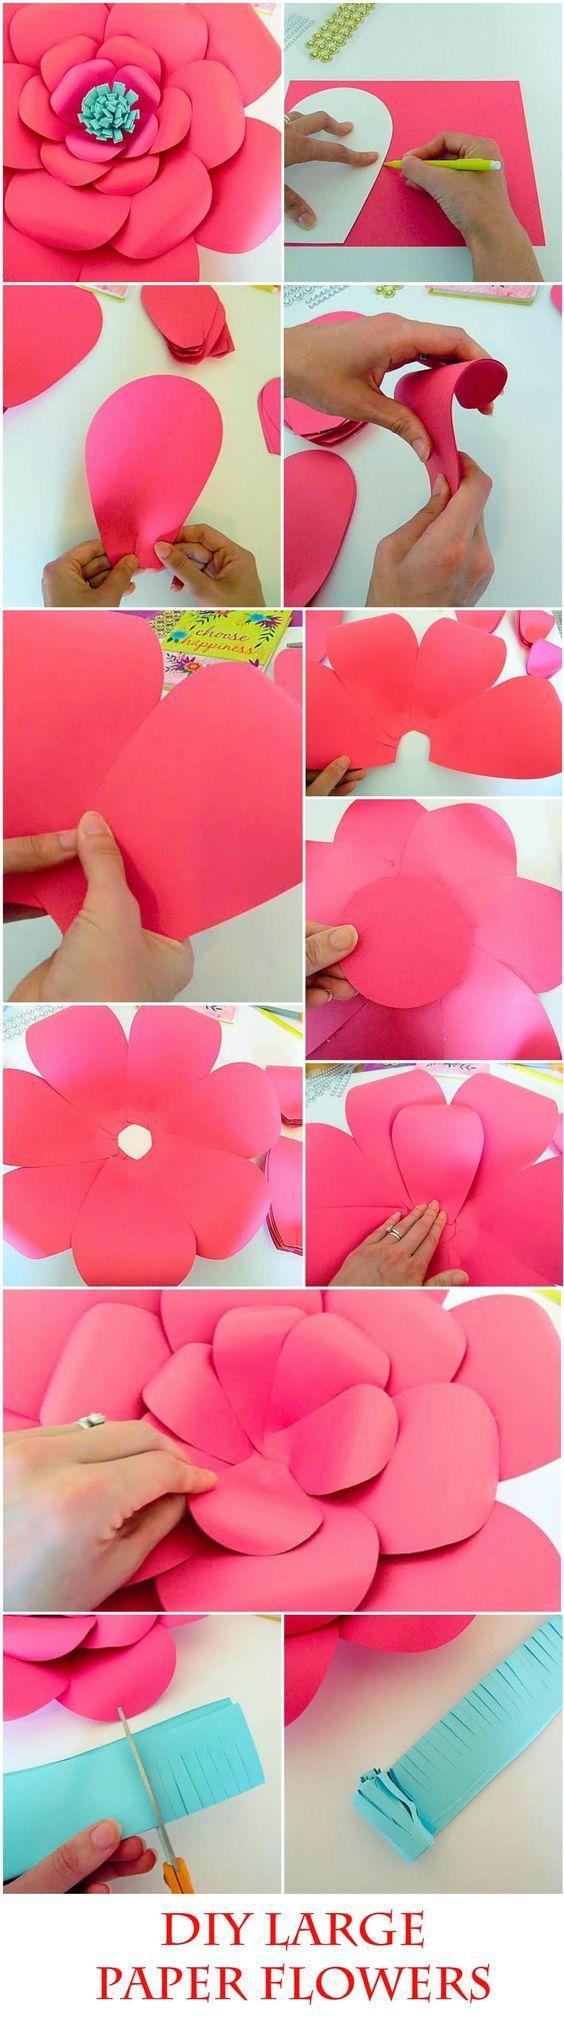 Diy giant paper flower templates tutorial diy paper flower making diy giant paper flower templates tutorial diy paper flower making kit svg paper mightylinksfo